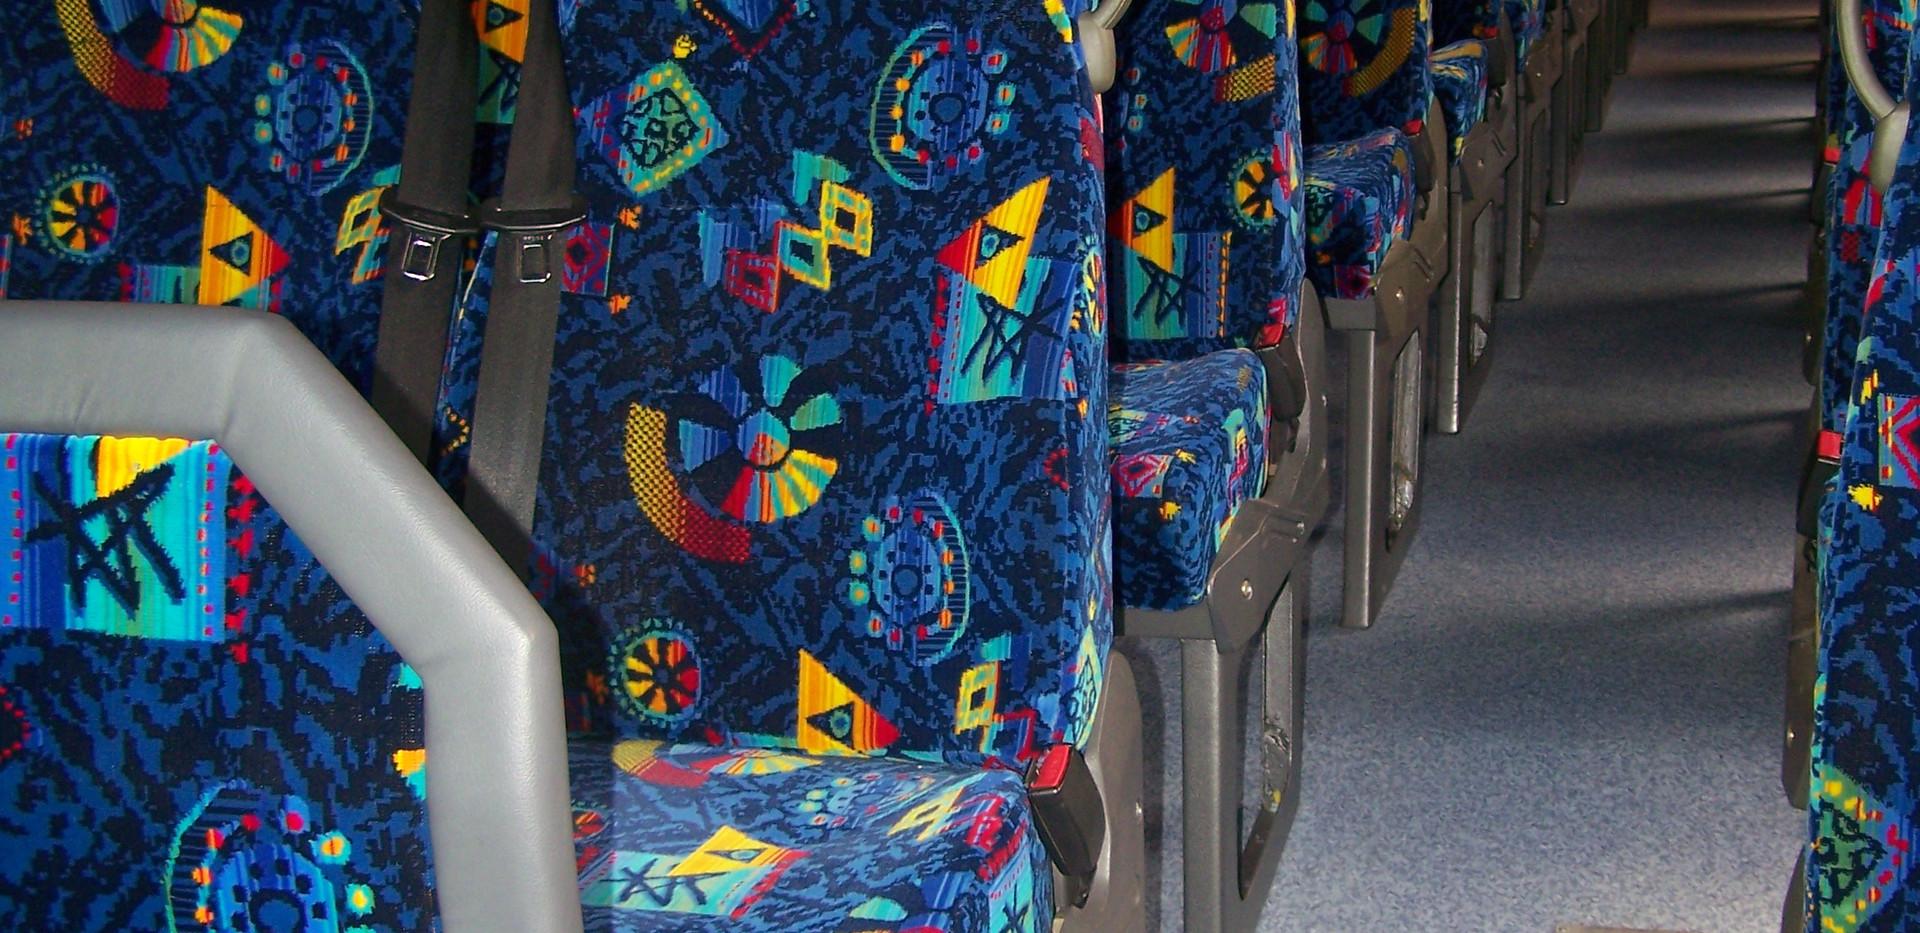 Autobus Floor and Seat07.JPG